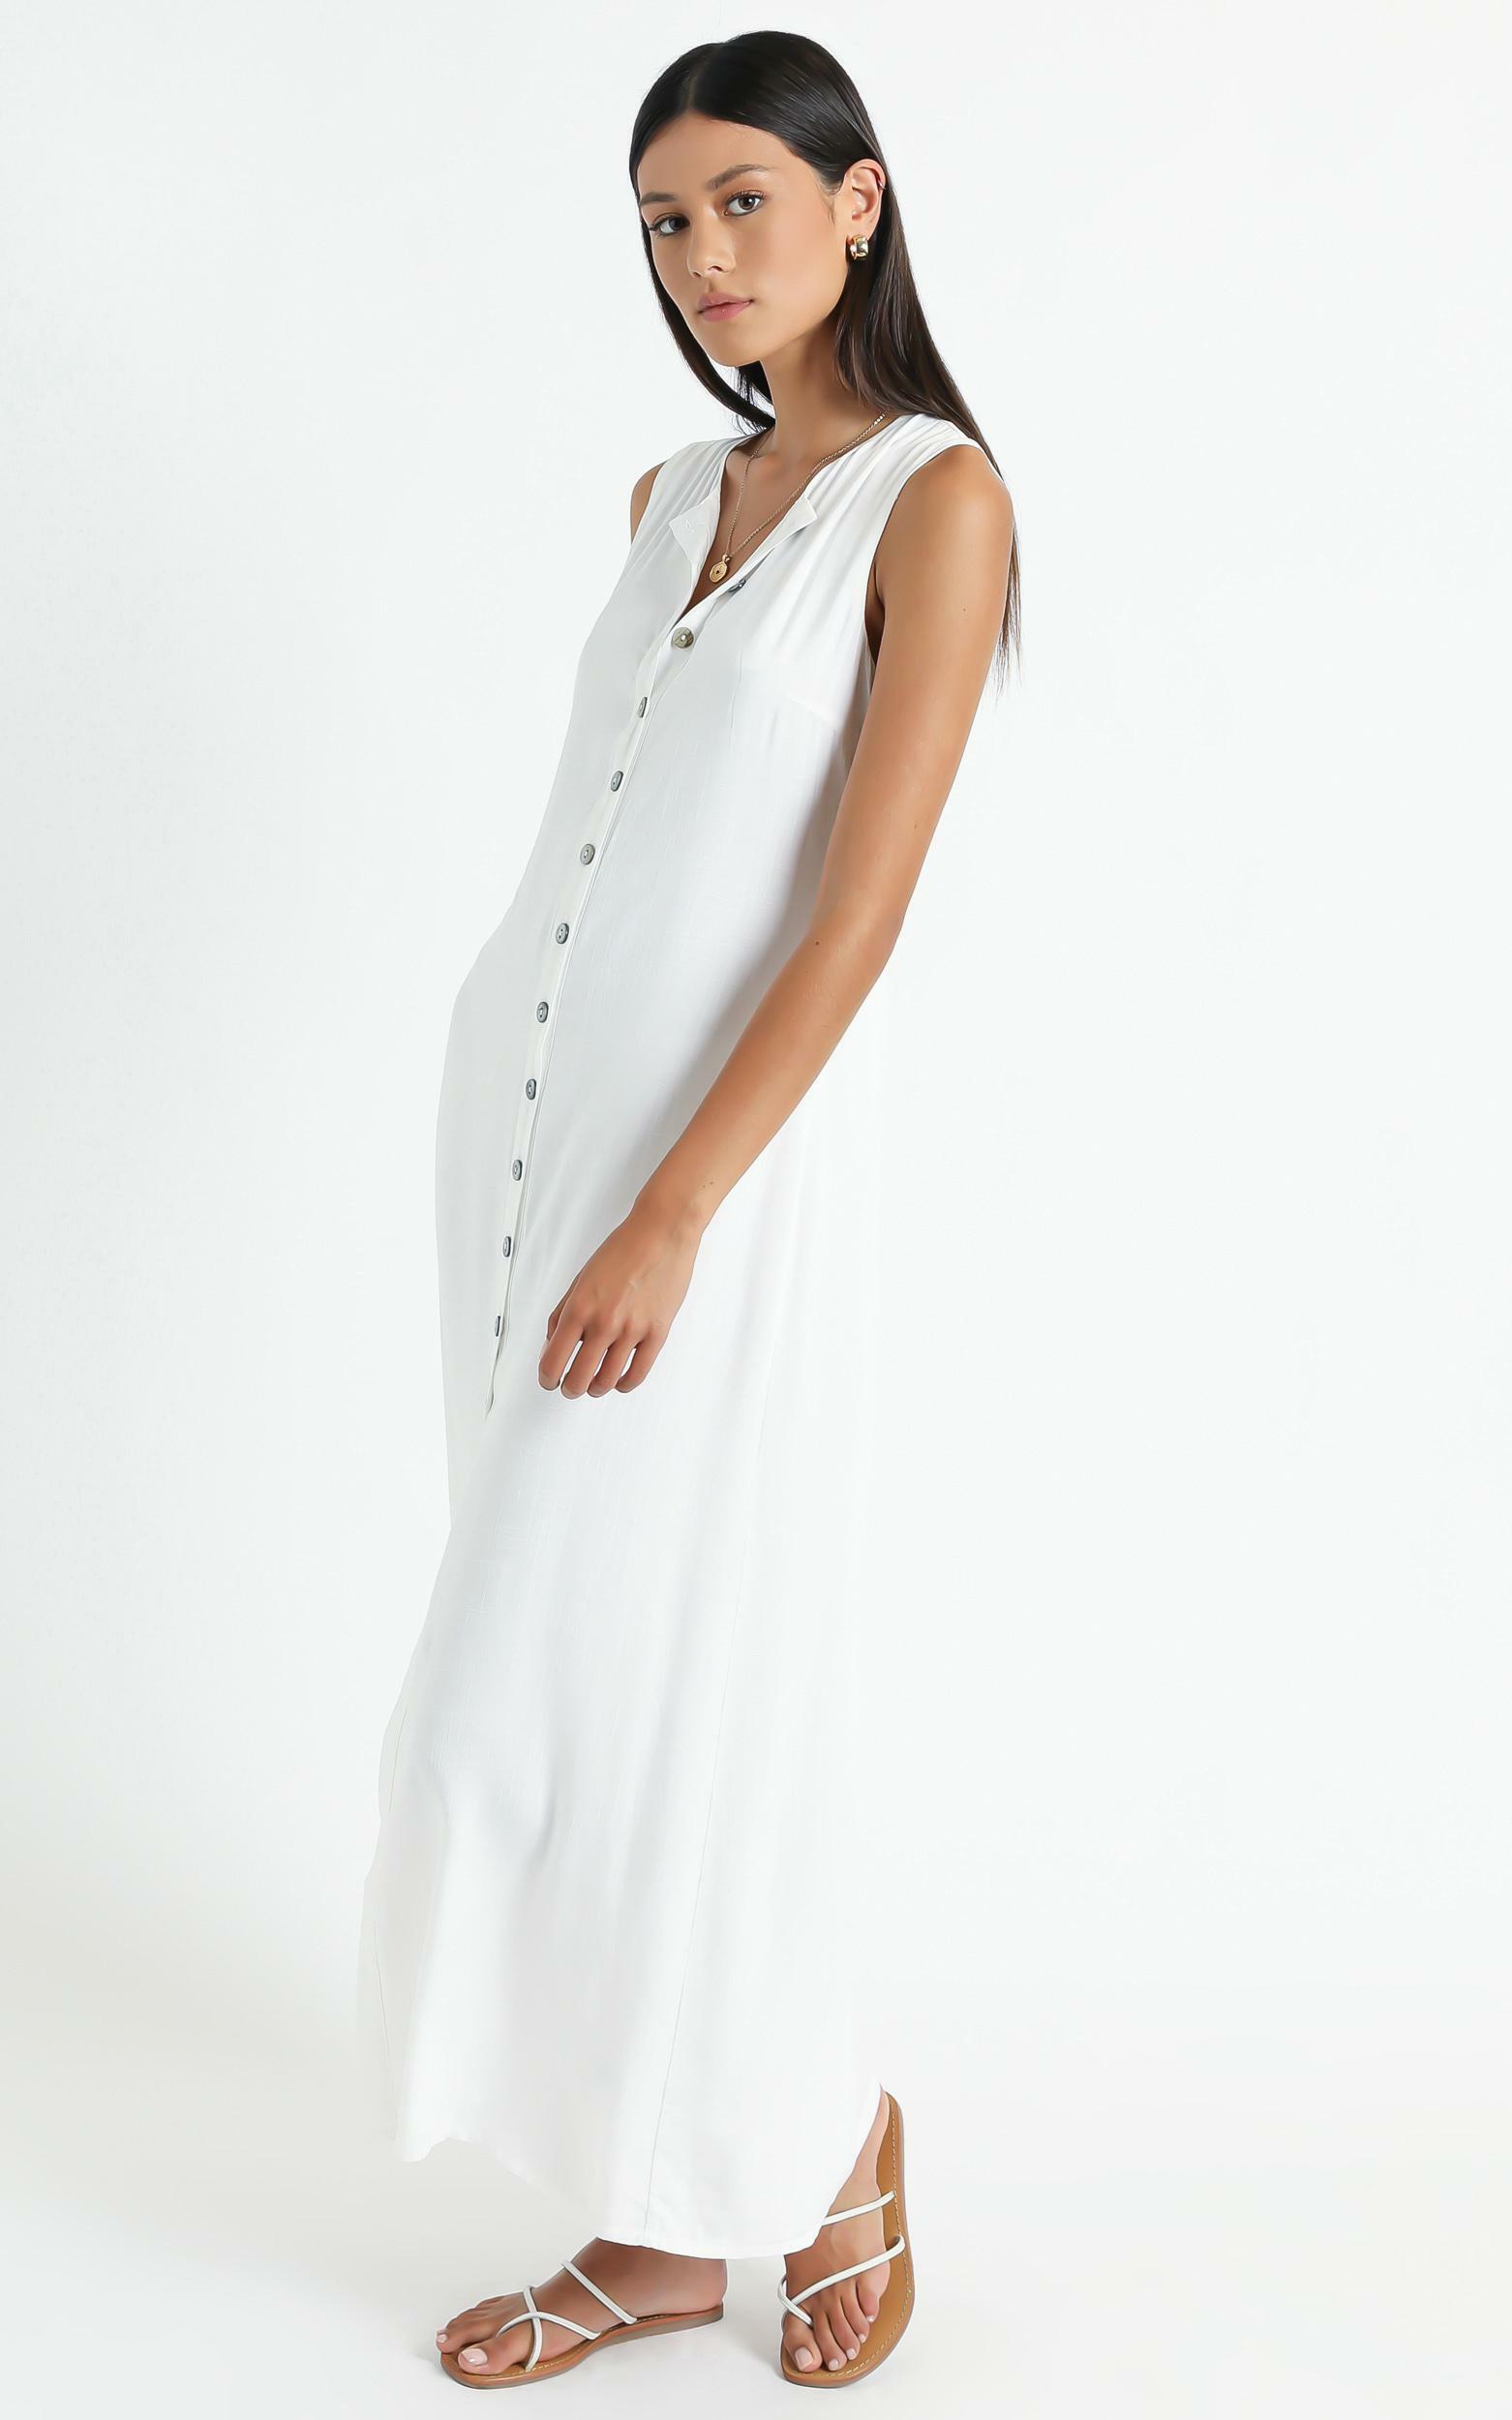 Izmir Midi dress in White - 6 (XS), White, hi-res image number null